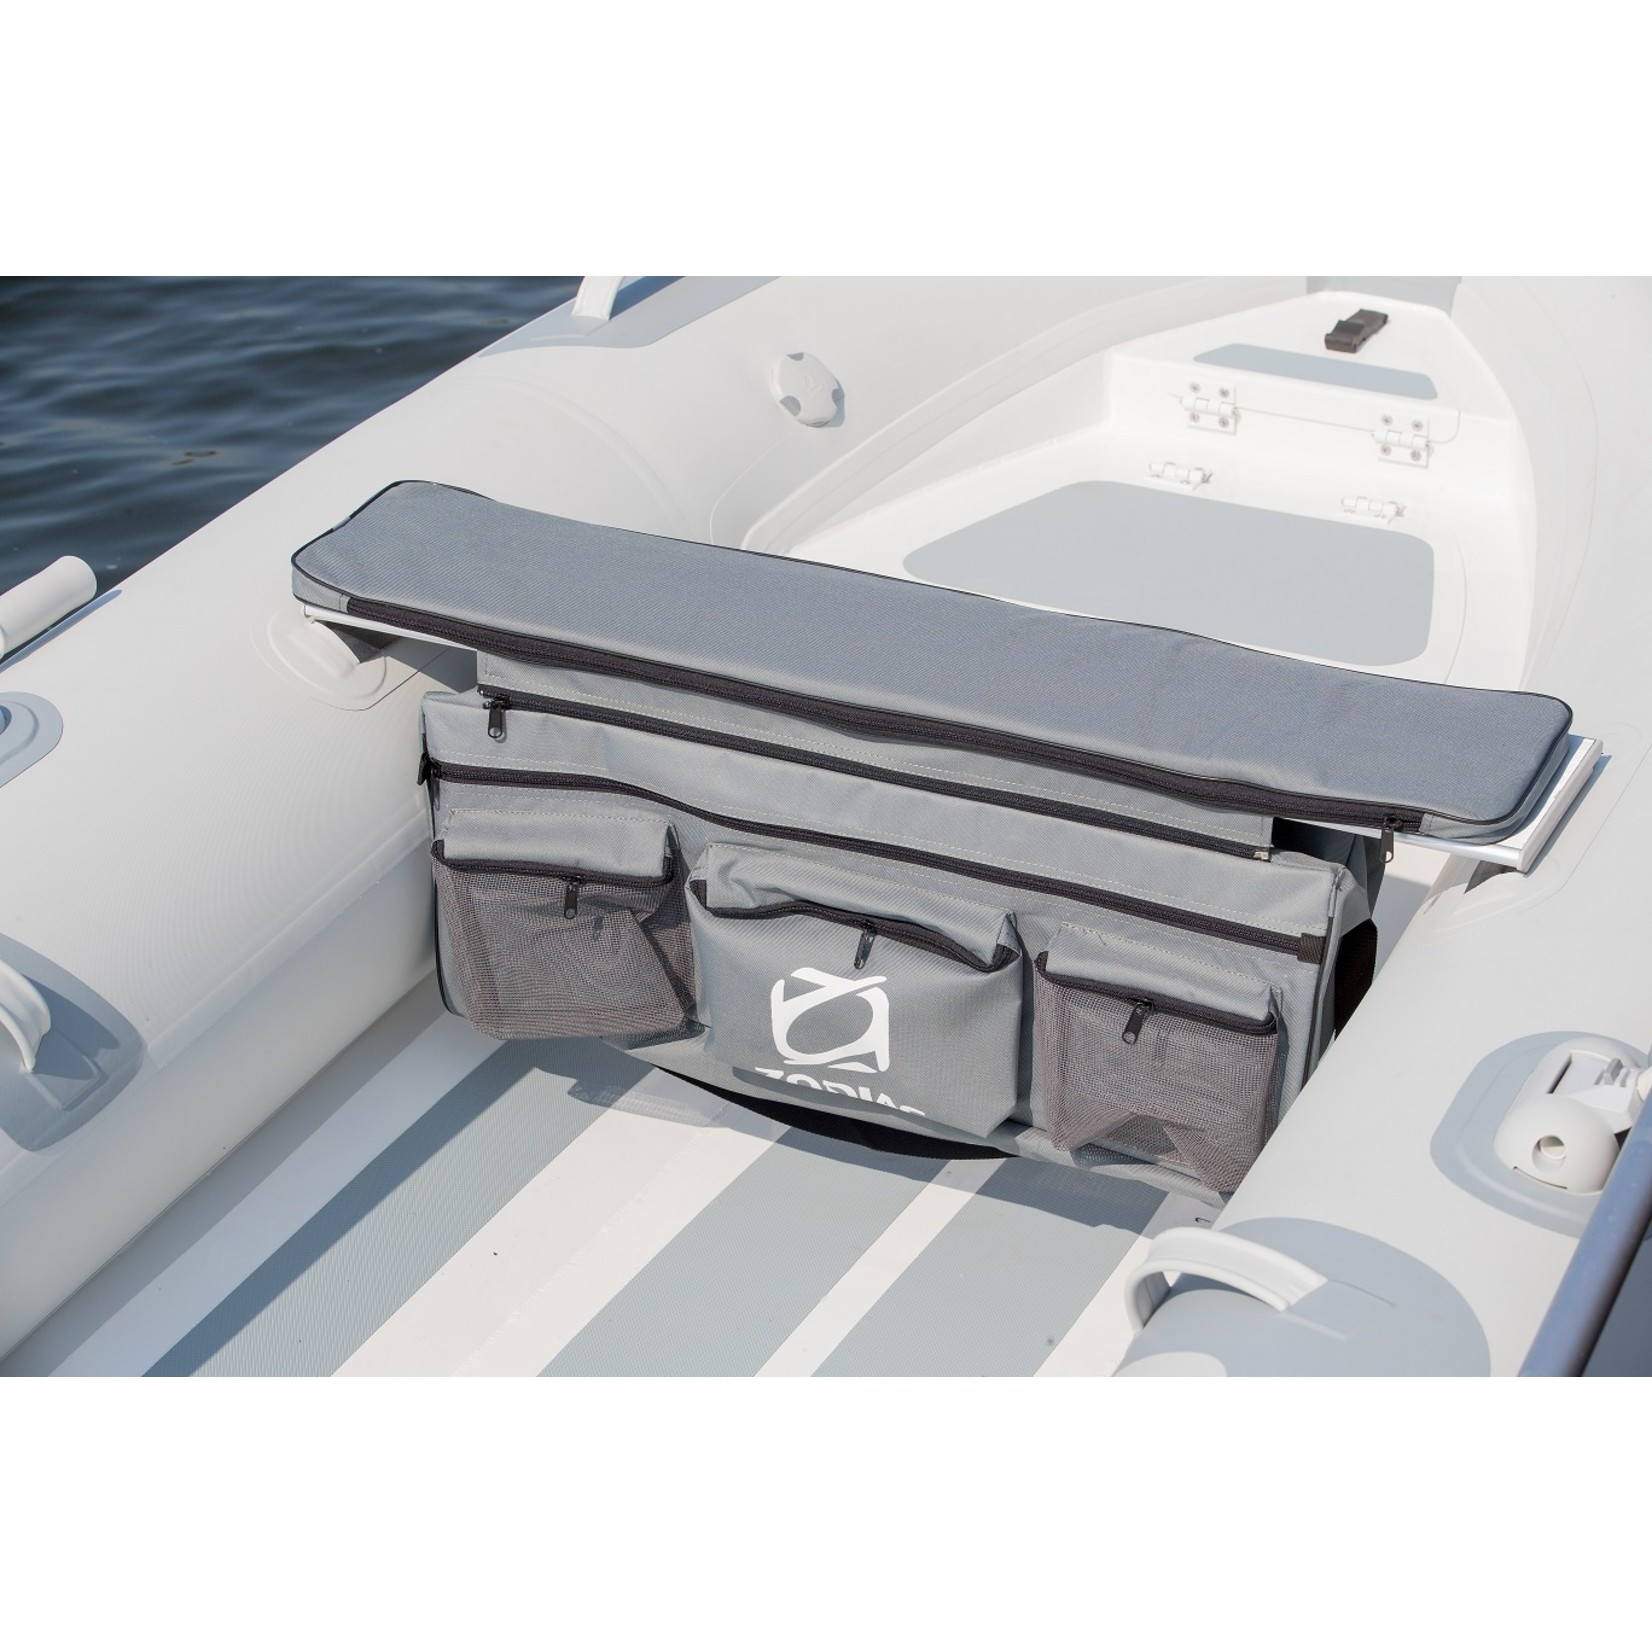 Zodiac Cadet 360 DL ALU RIB - Deck & Locker (3.63 mtr.)